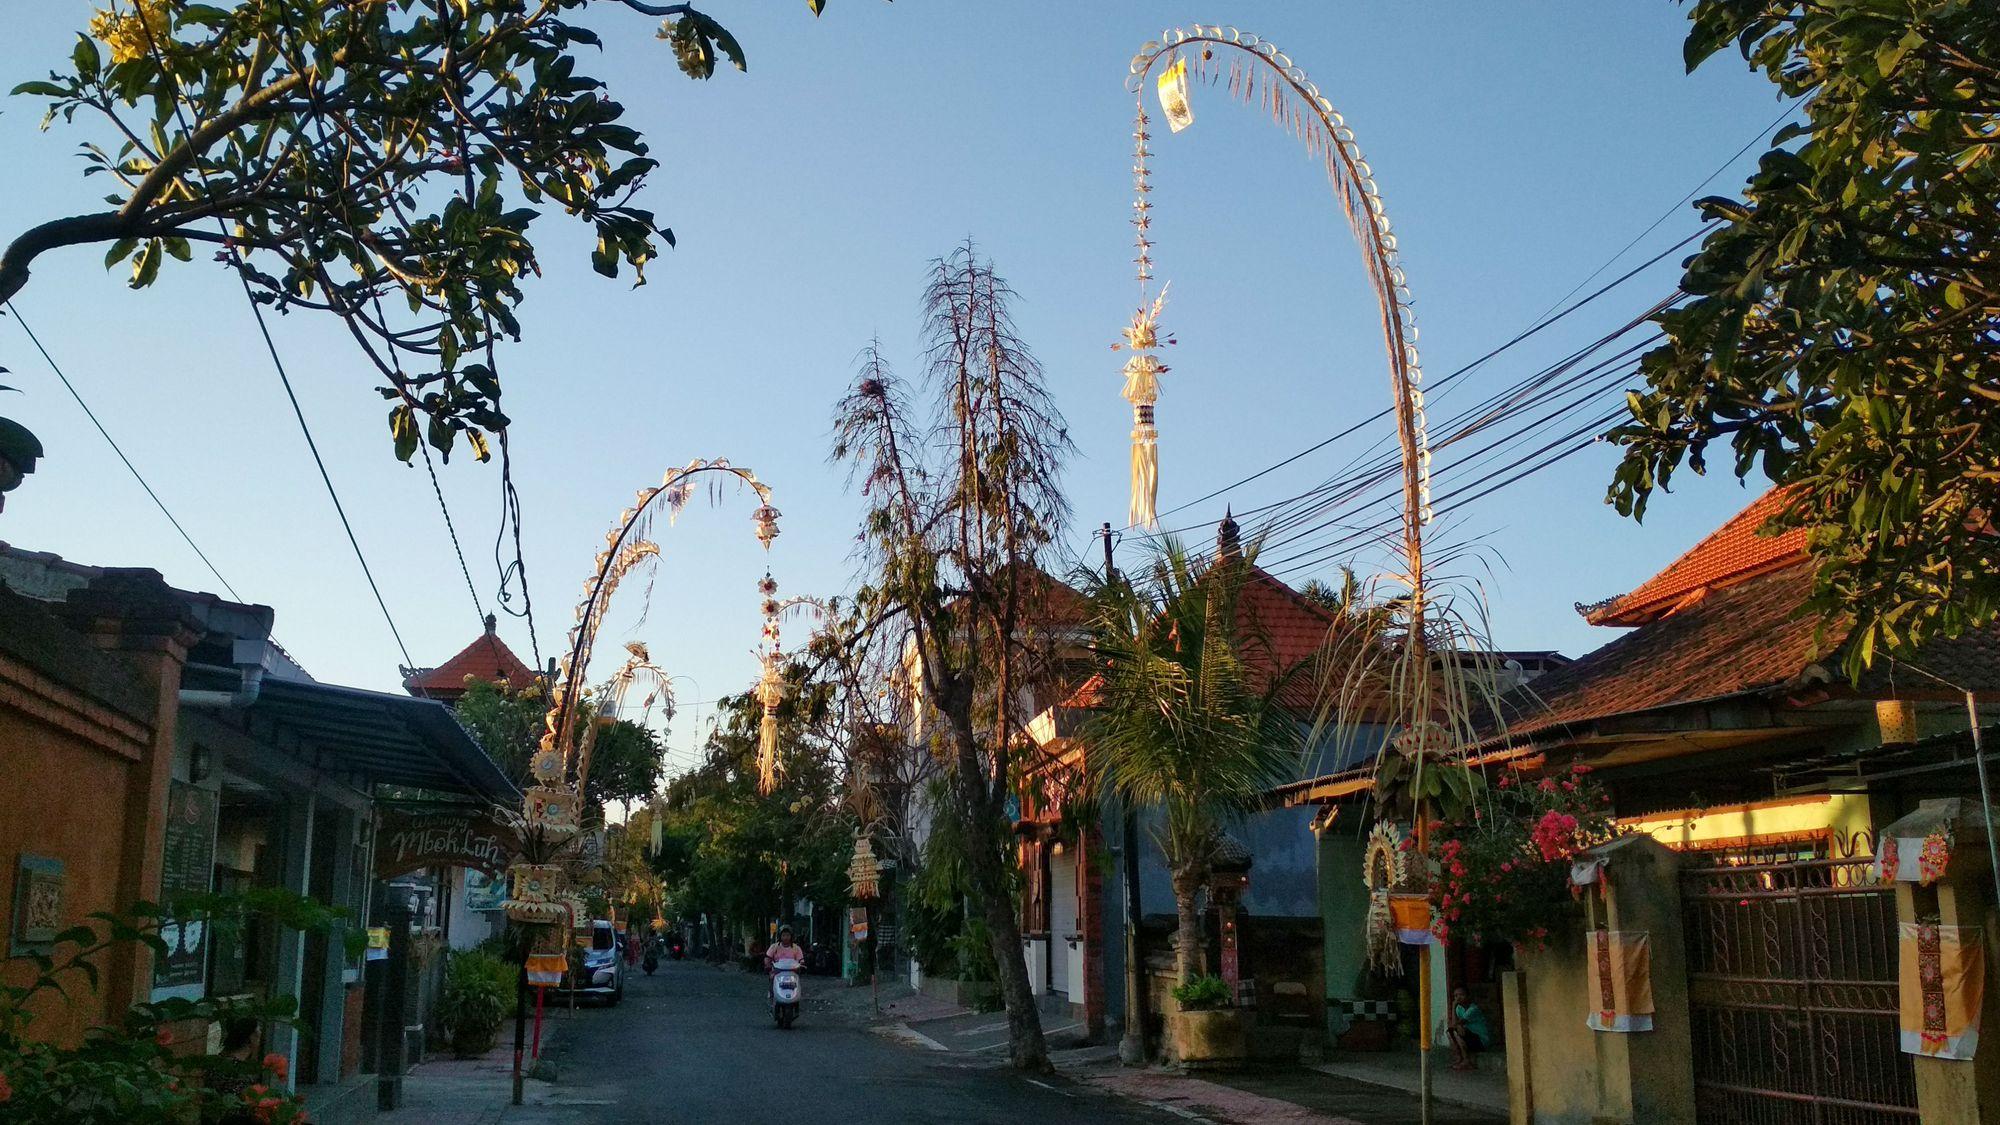 Makna Filosofi Janur Kuning pada Masyarakat Bali